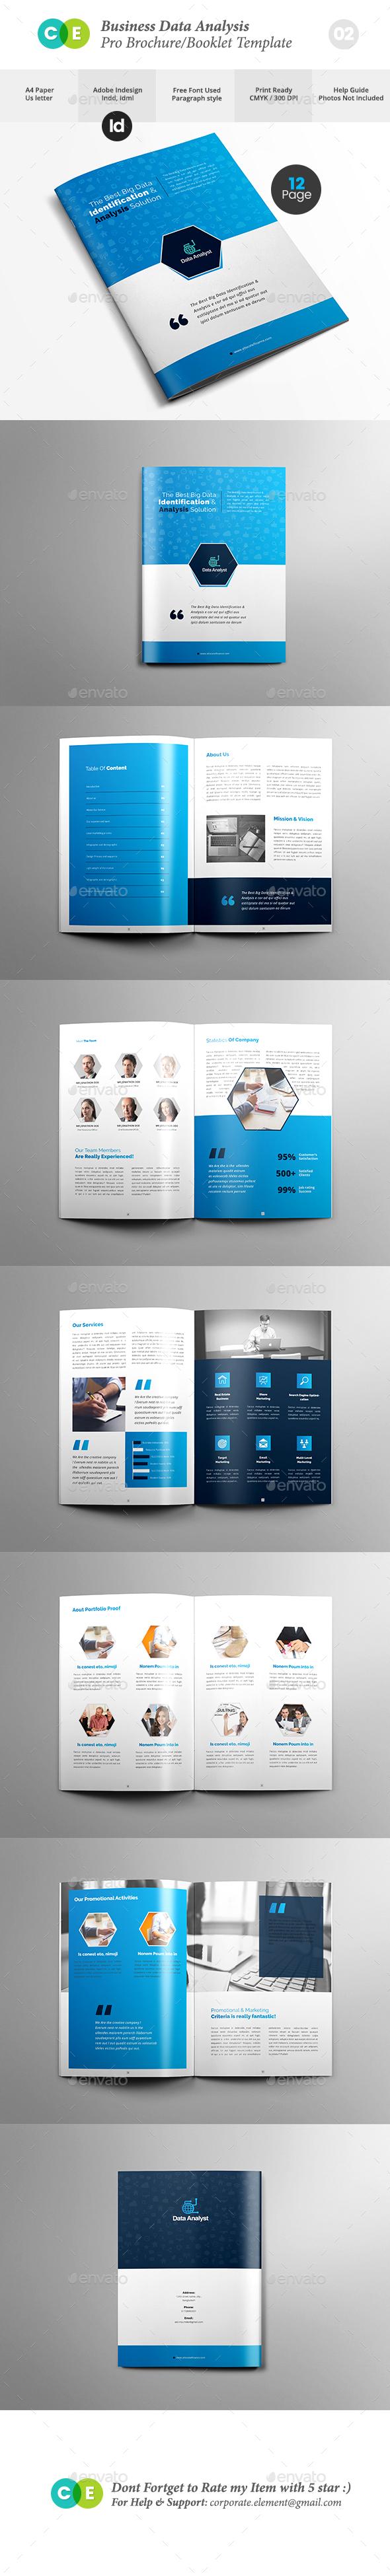 Pro Business Data Analysis Brochure V02 - Brochures Print Templates